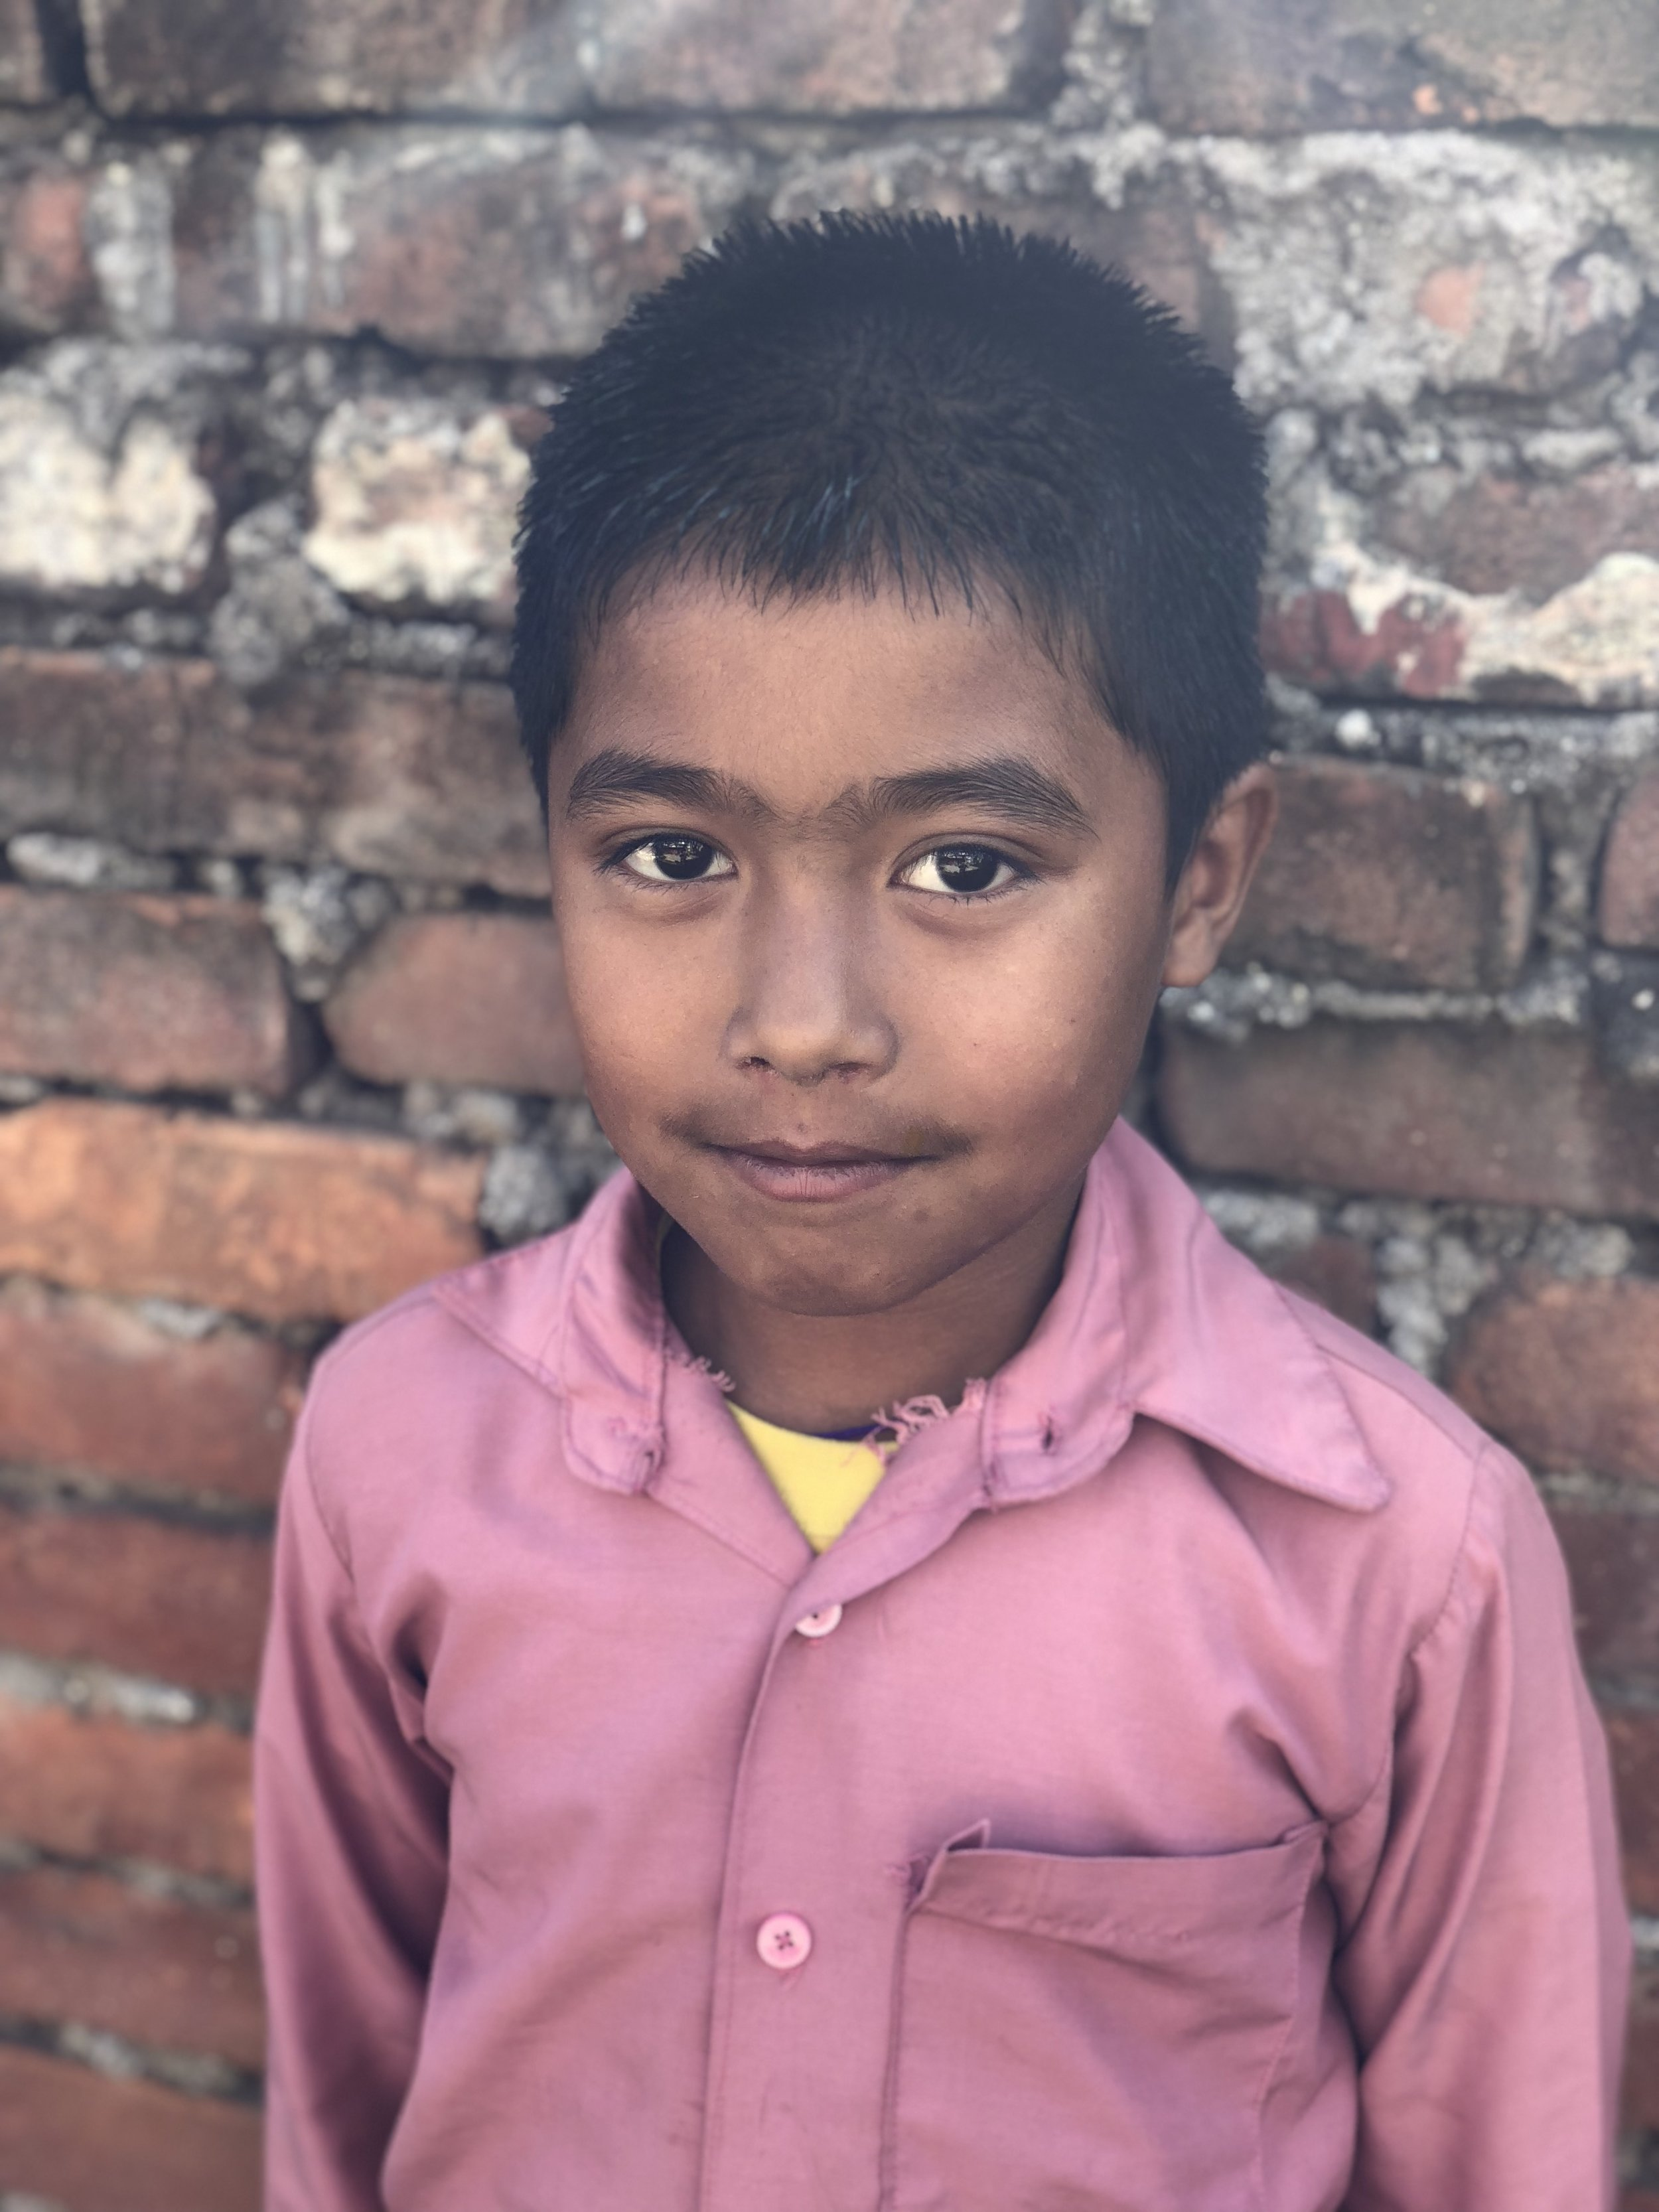 Sokul  Age 8  He wants to become a teacher